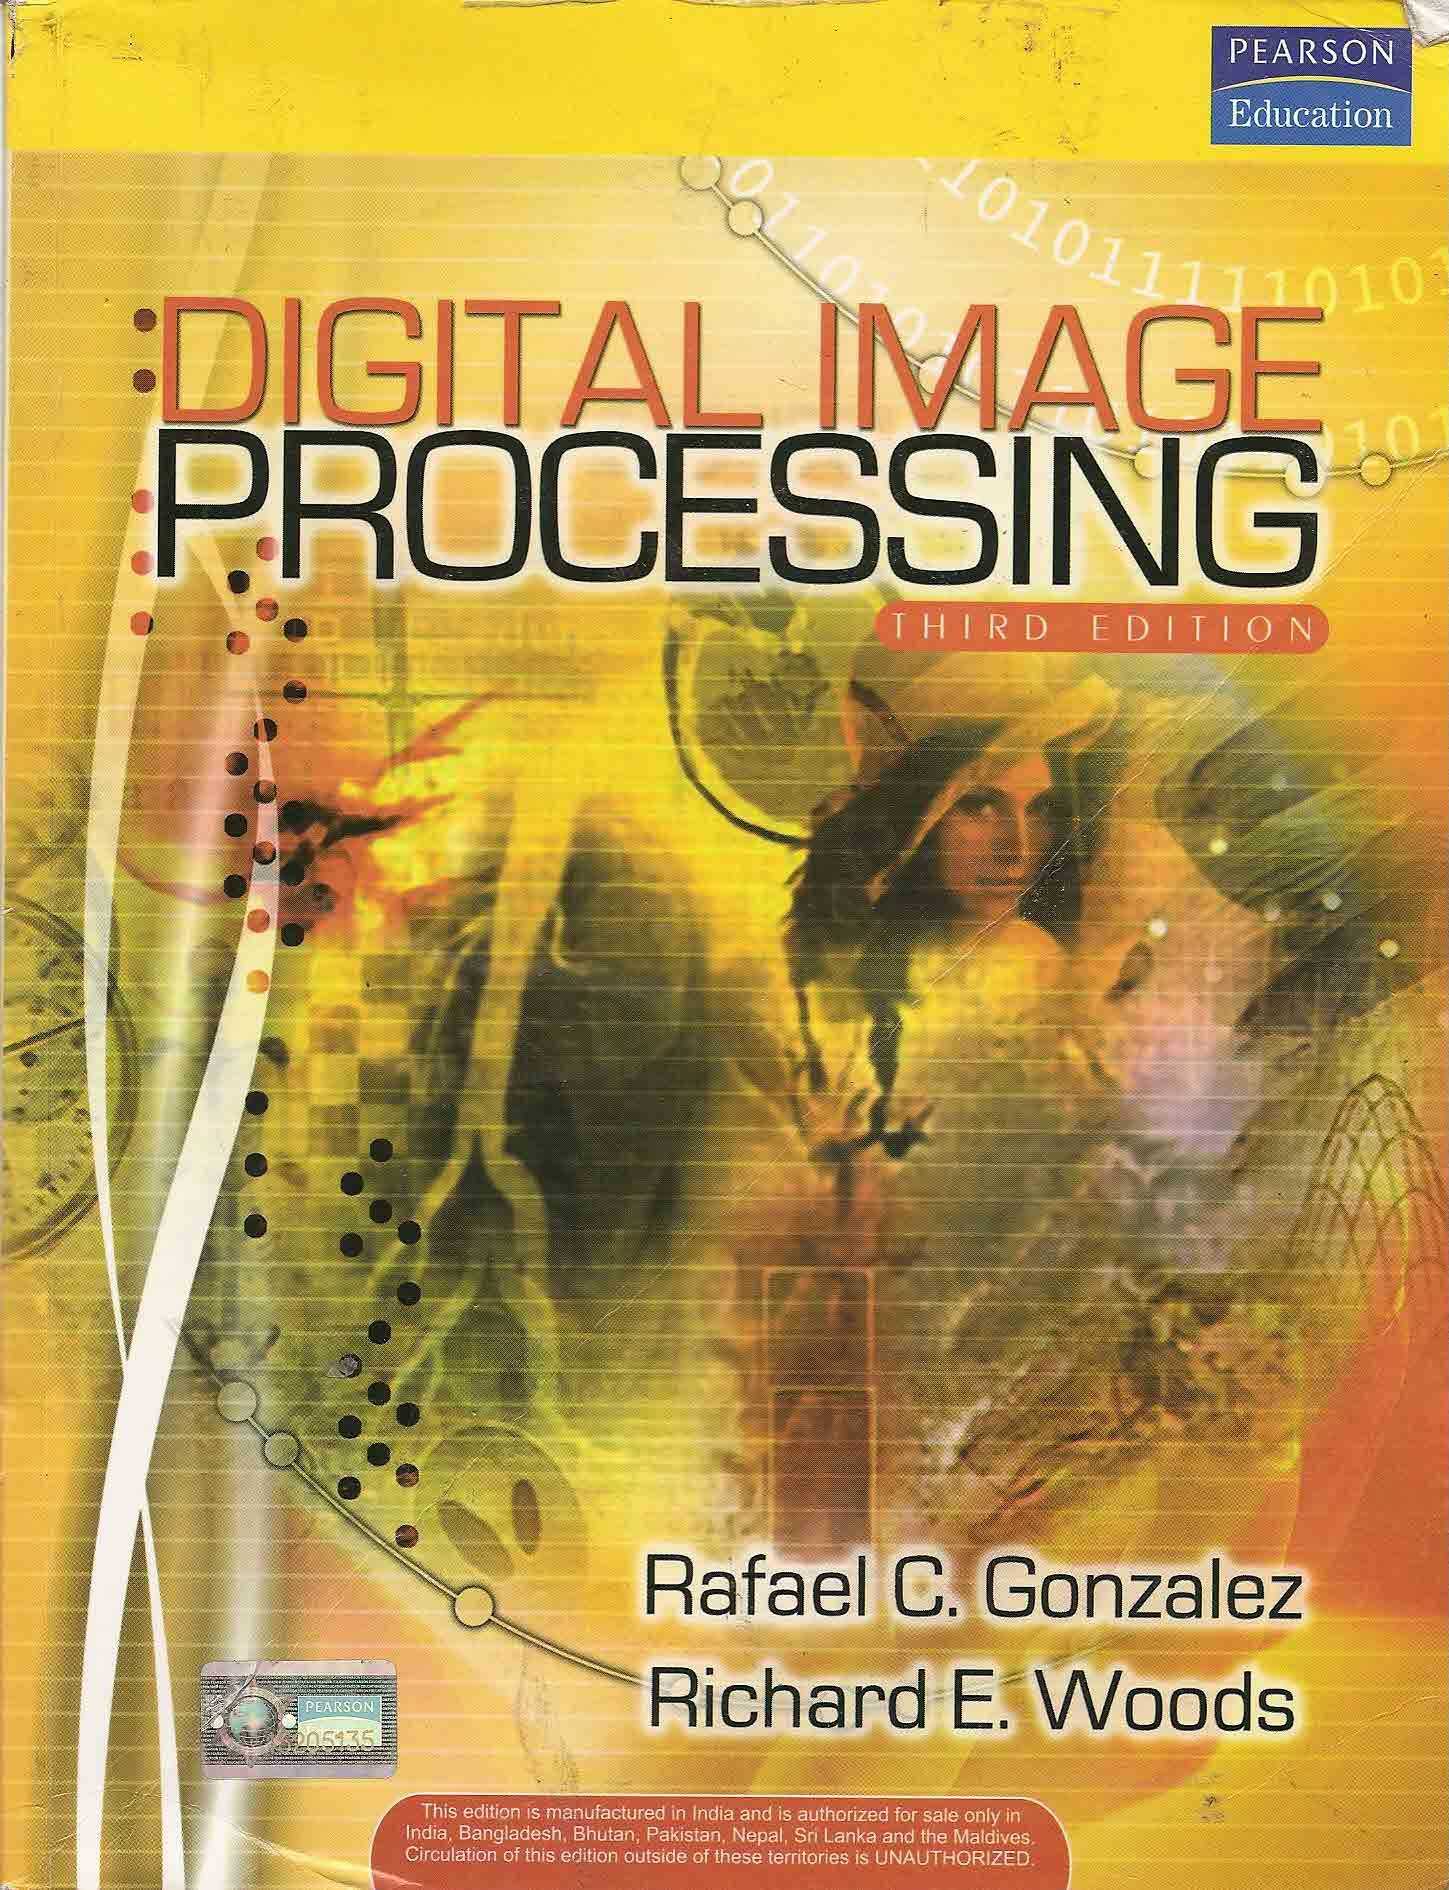 Image Processing Gonzalez Pdf